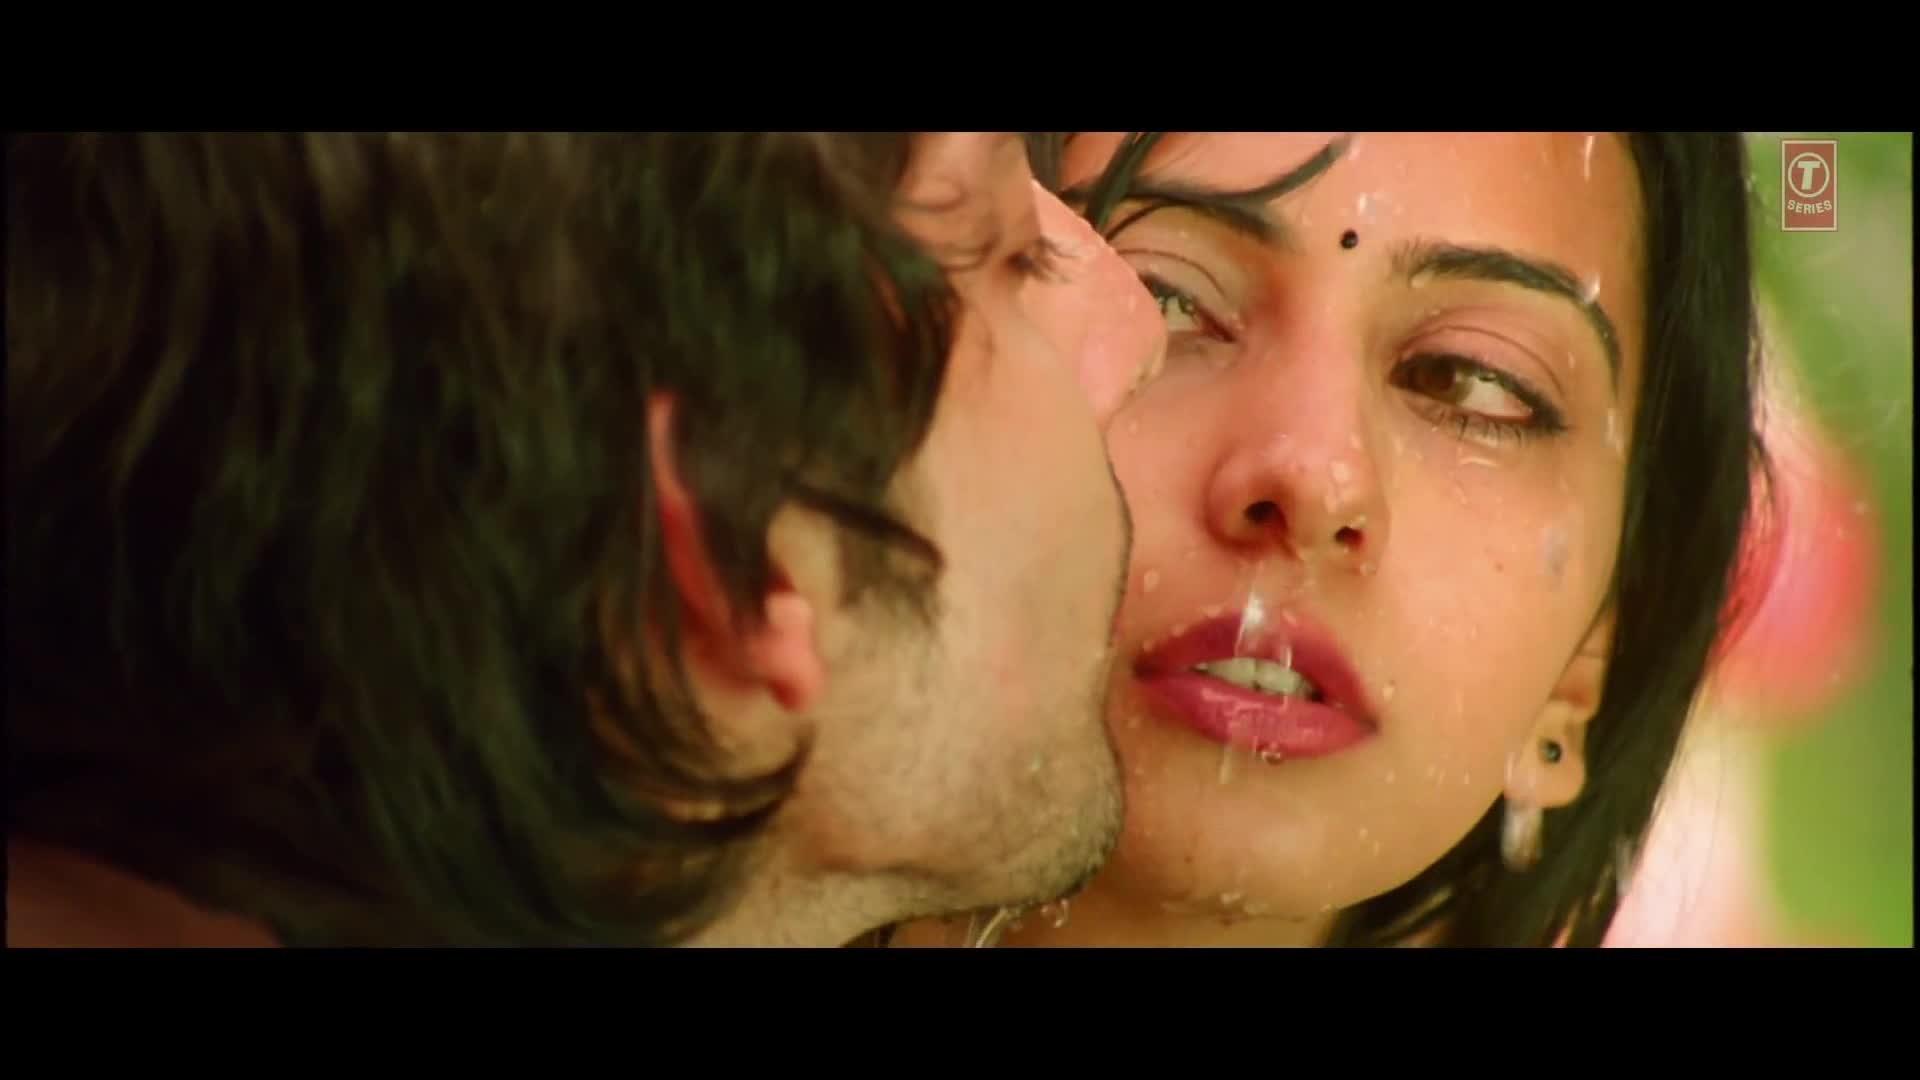 Hd wallpaper yaariyan - Yaariyan Drama Romance Bollywood 4 Wallpaper 1920x1080 378308 Wallpaperup